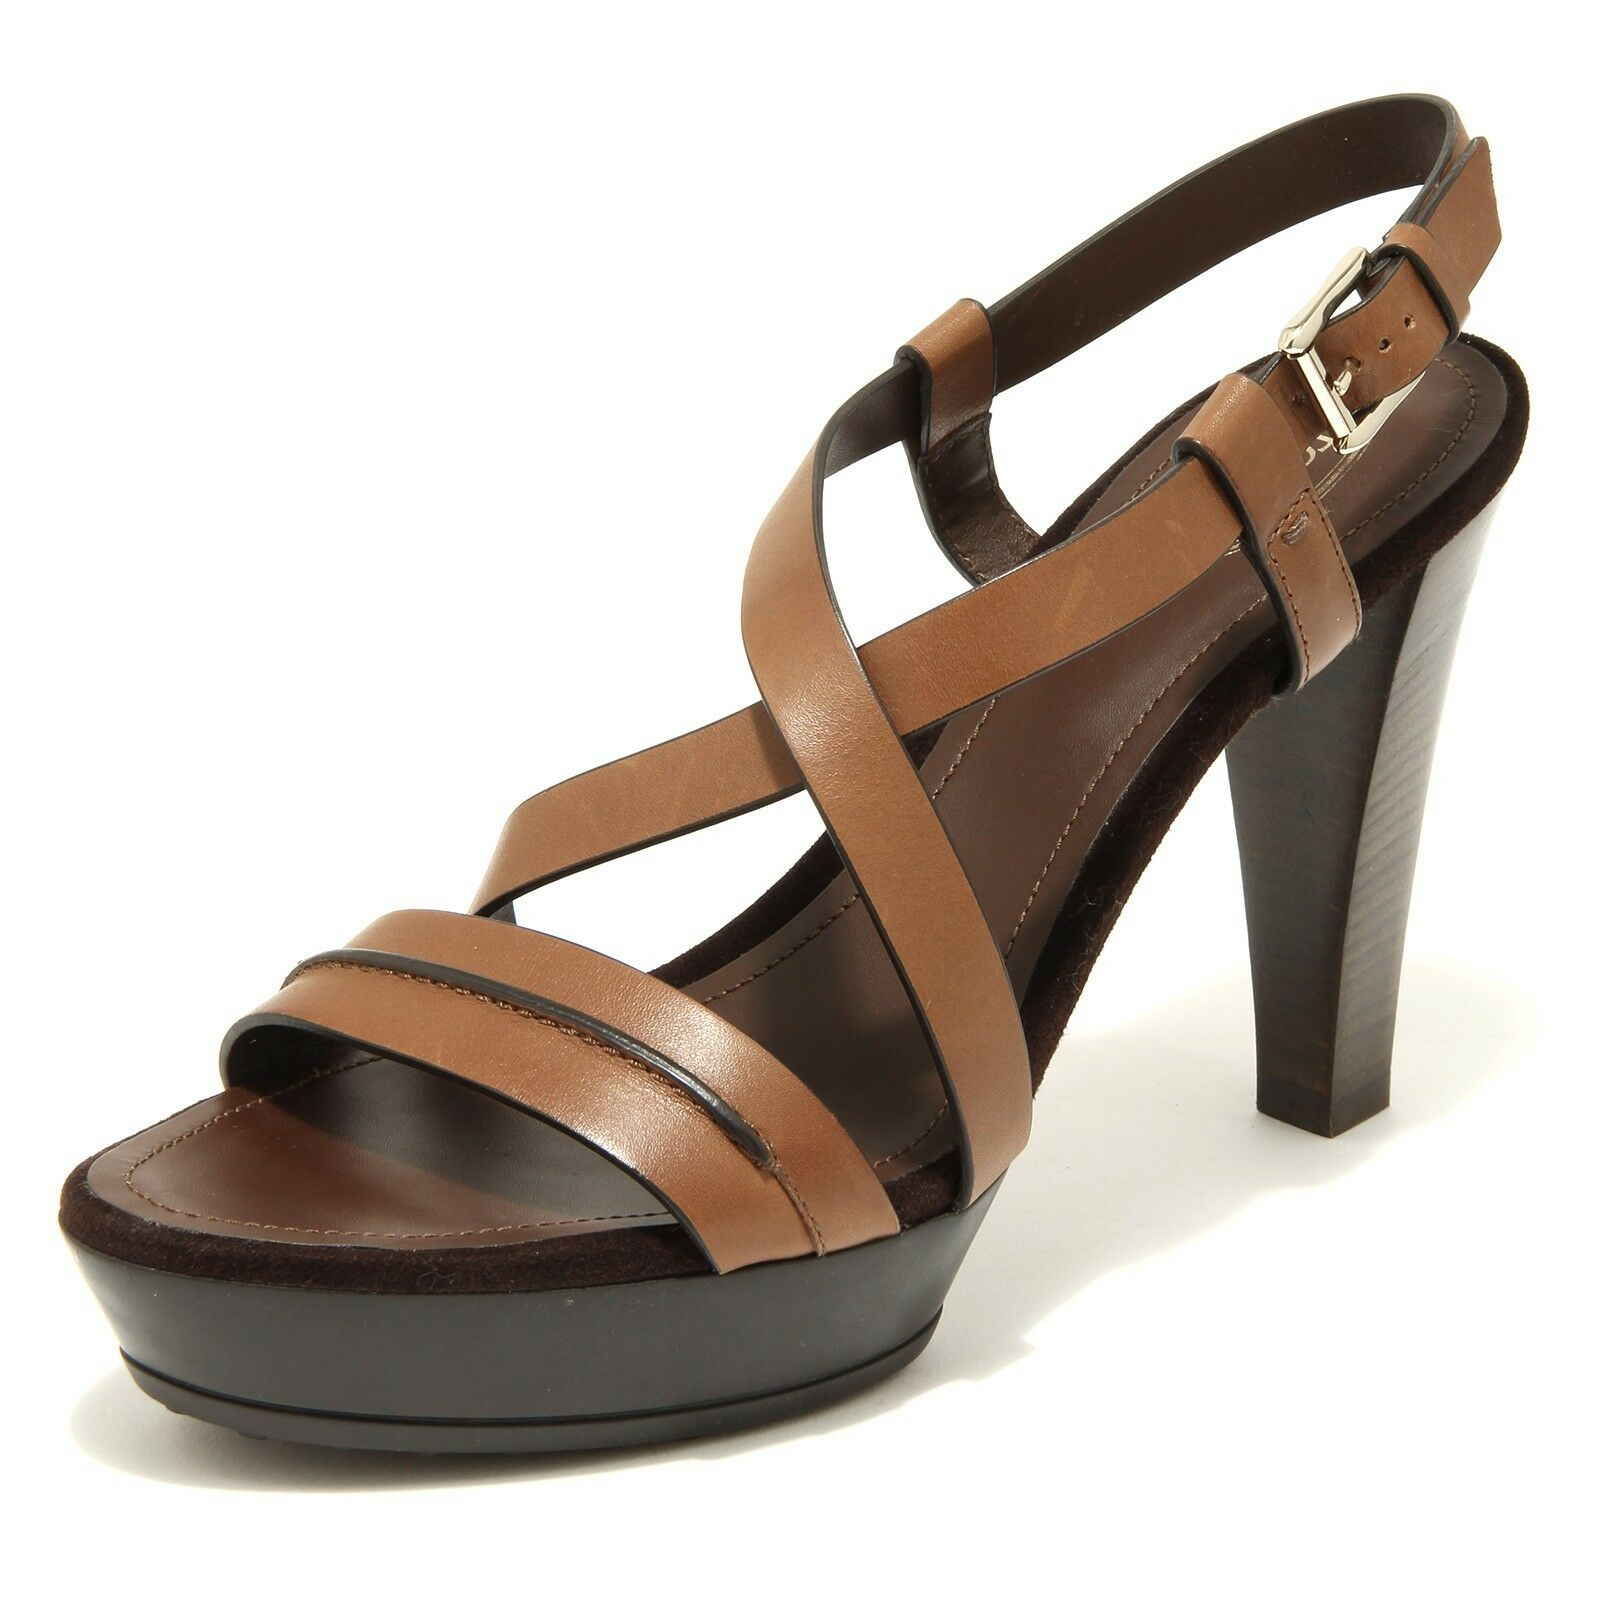 2831 H Sandali mujer mujer mujer Tod'S Plat Gomma Fasce incroc zapatos Zapatos de mujer  tienda de ventas outlet